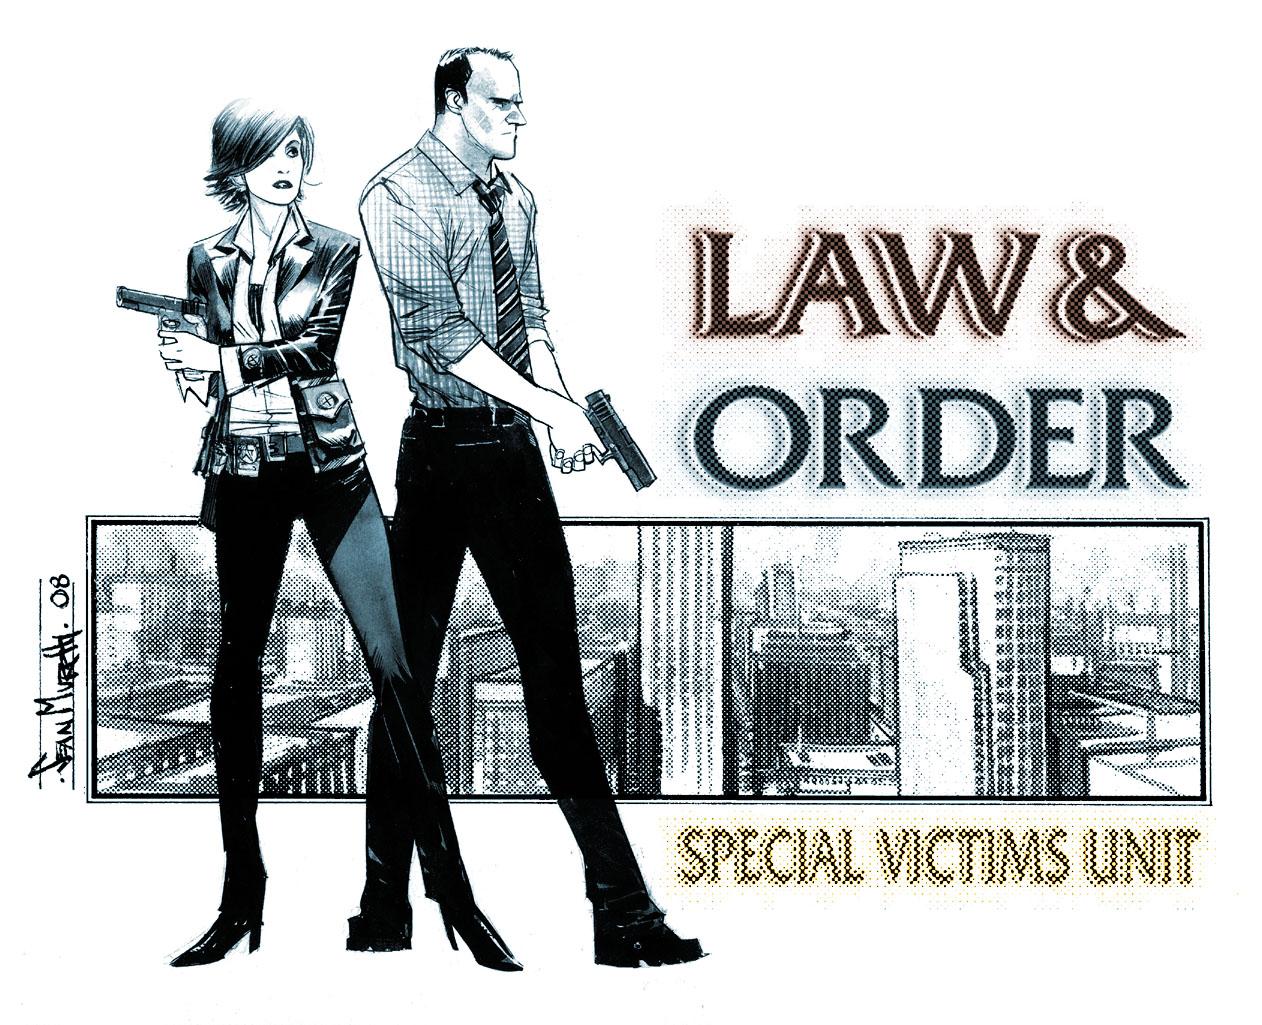 http://2.bp.blogspot.com/-1MdYCl27j7U/TiZ90ifVbII/AAAAAAAAAOA/LAU0stZ1hoE/s1600/Law_and_Order_SVU_Pinup_by_seangordonmurphy.jpg